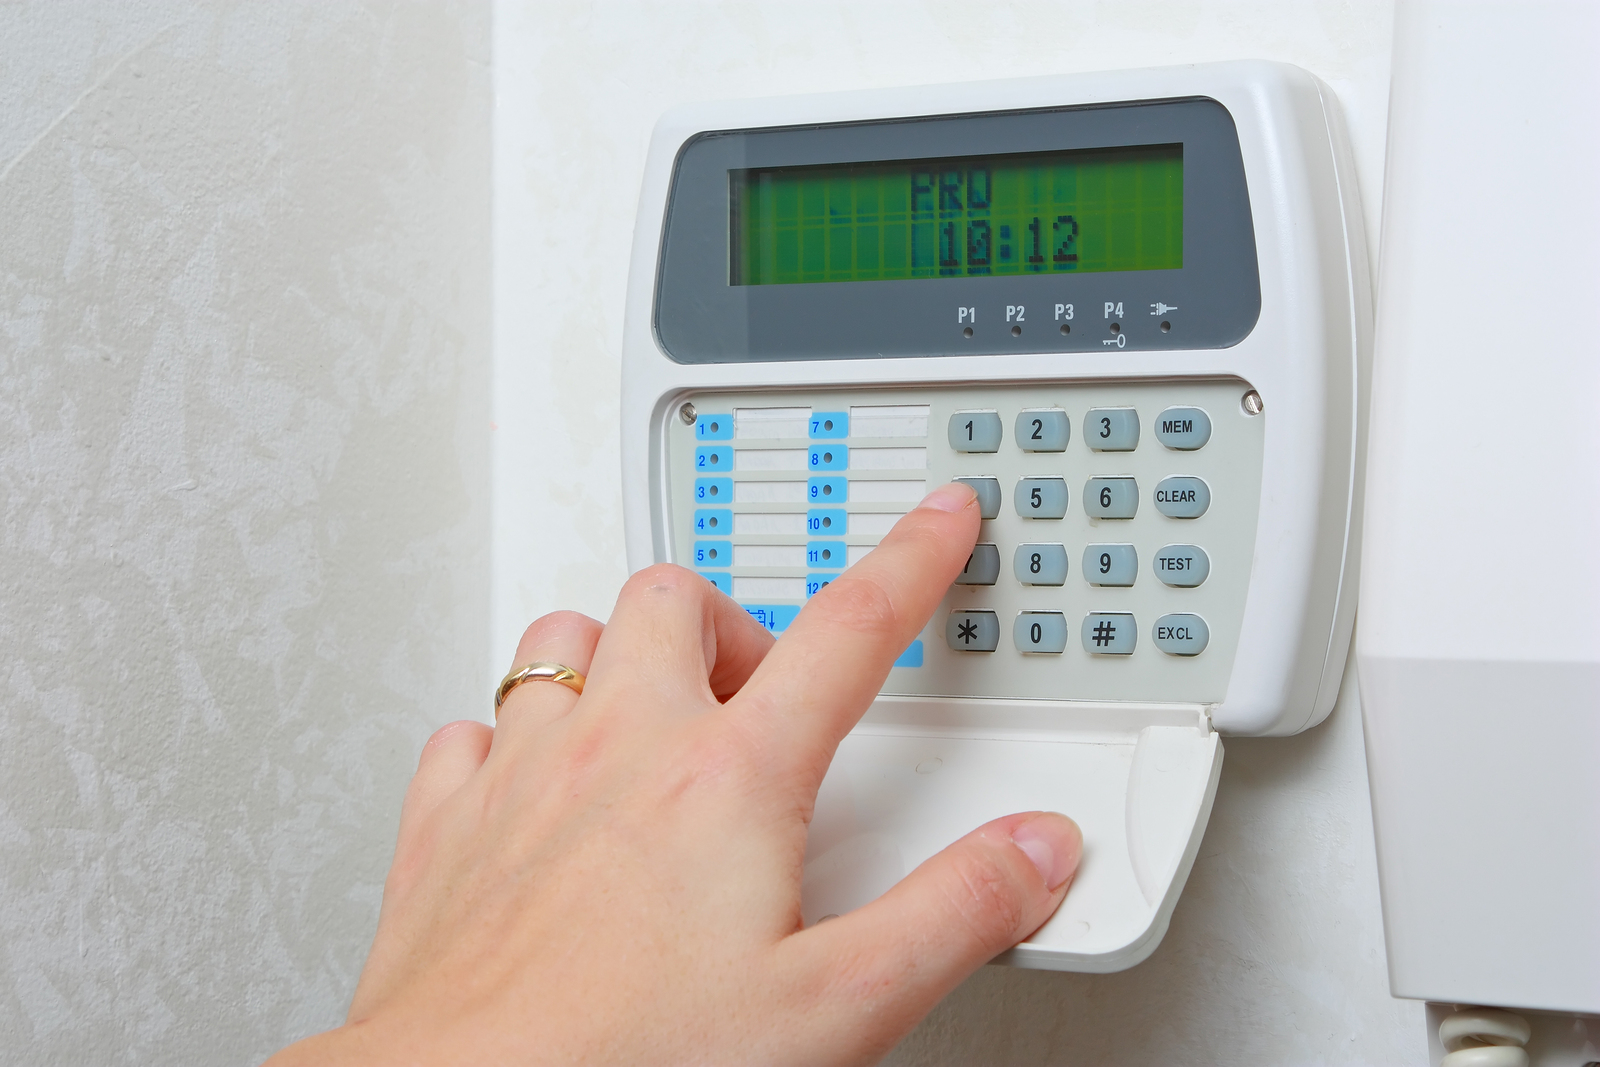 Alarmanlagen-Mietvertrag mit Fernüberwachung – Mietvertrag?